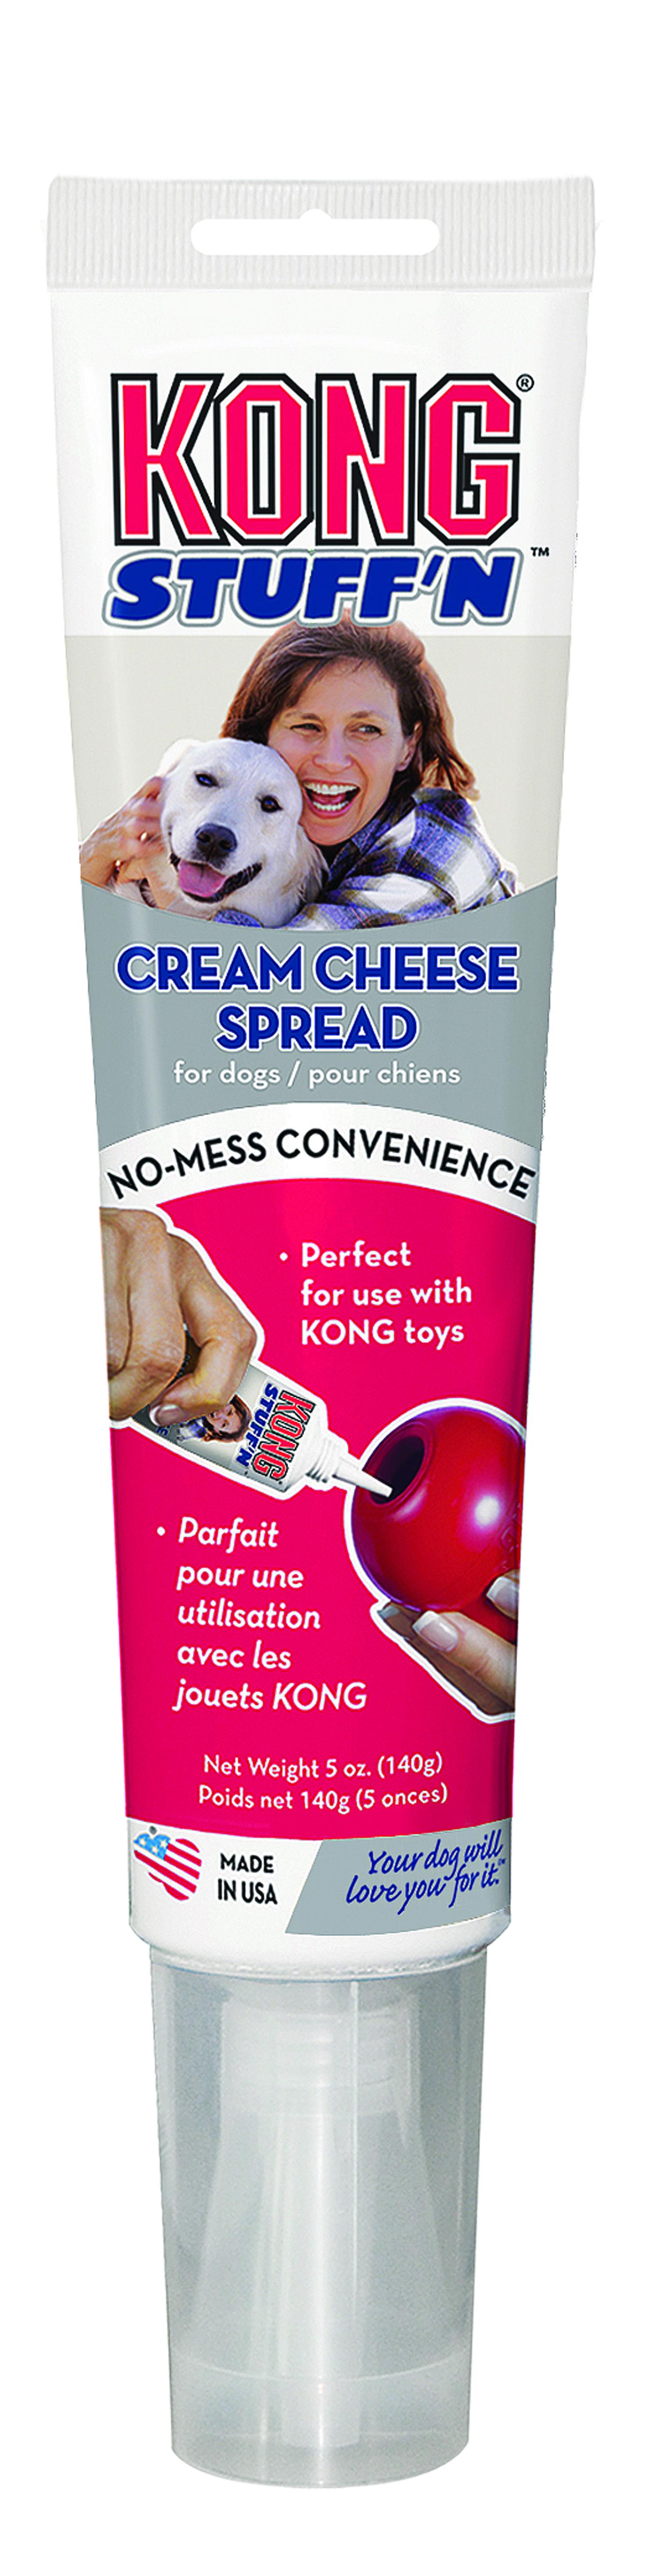 Kong Stuff N Cream Cheese Spread